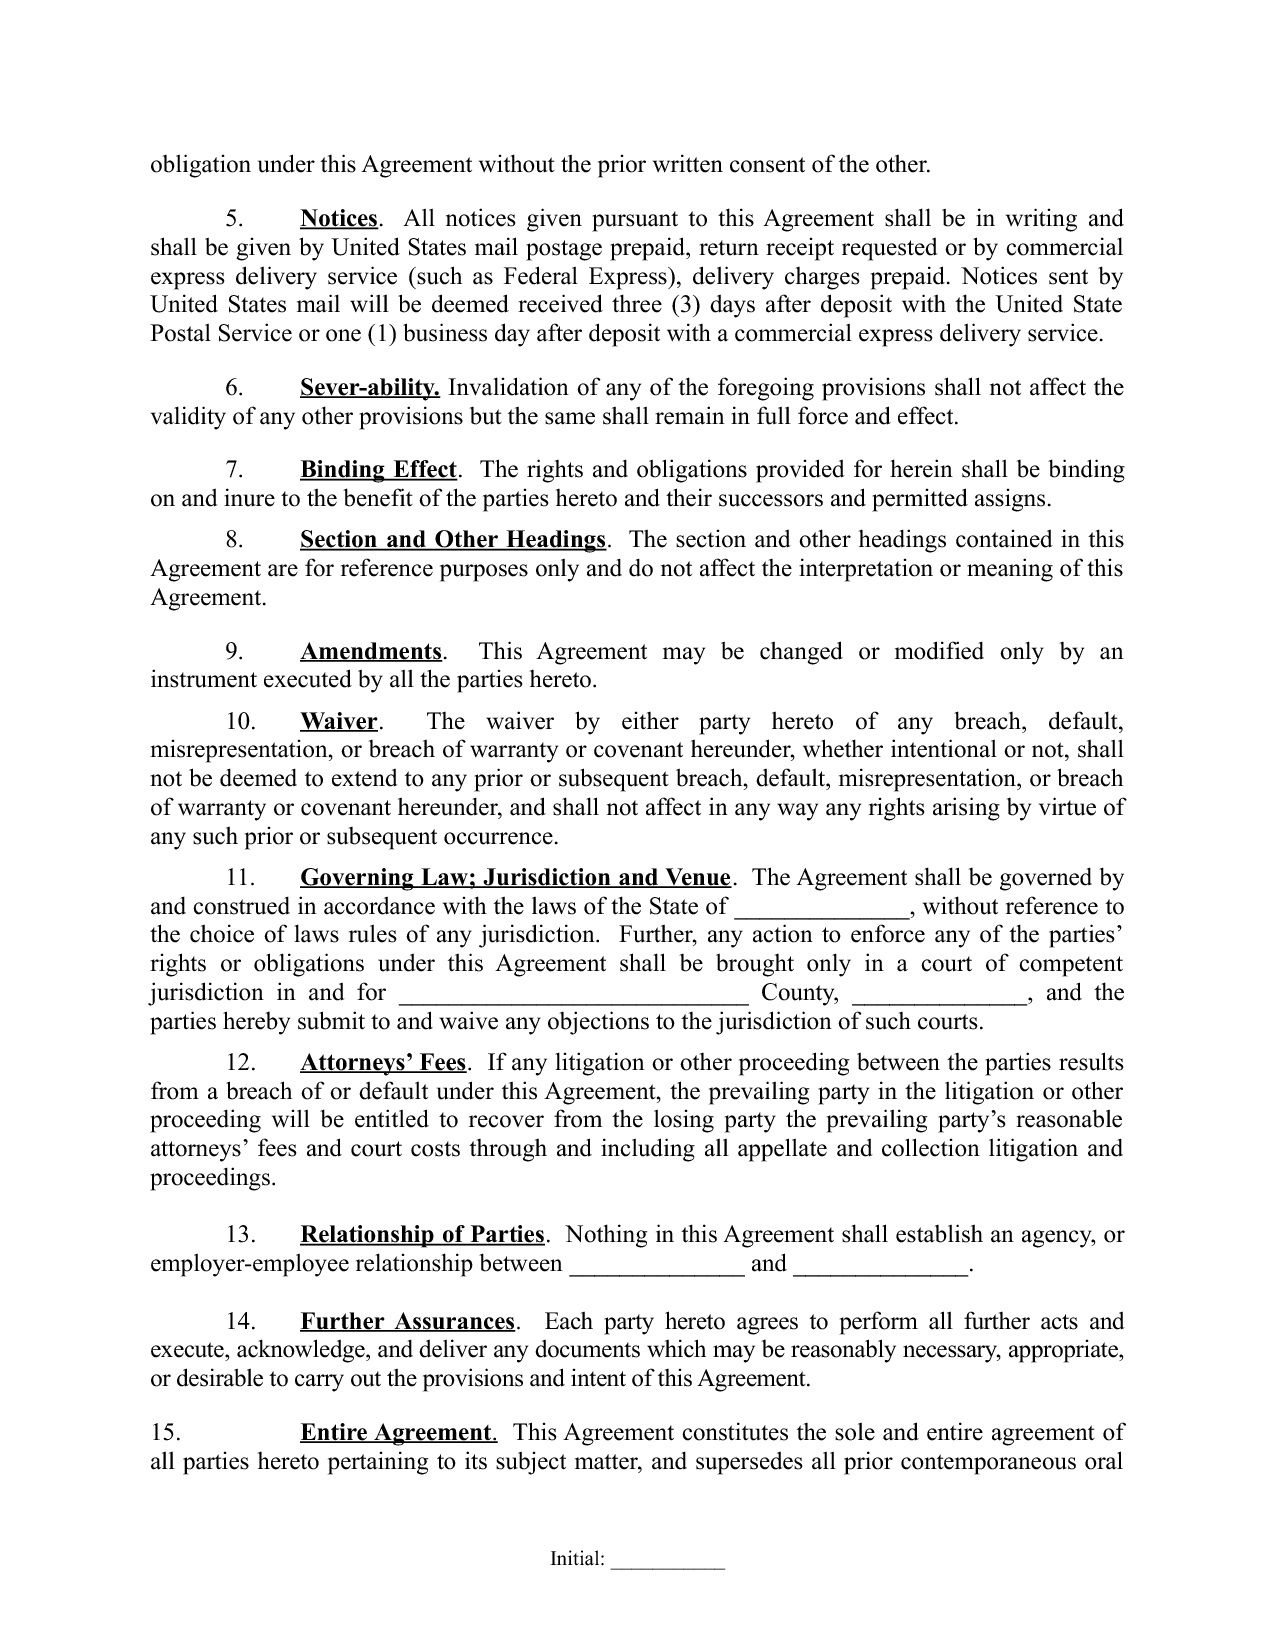 003 Wondrou Real Estate Partnership Agreement Template High Definition  Team InvestmentFull